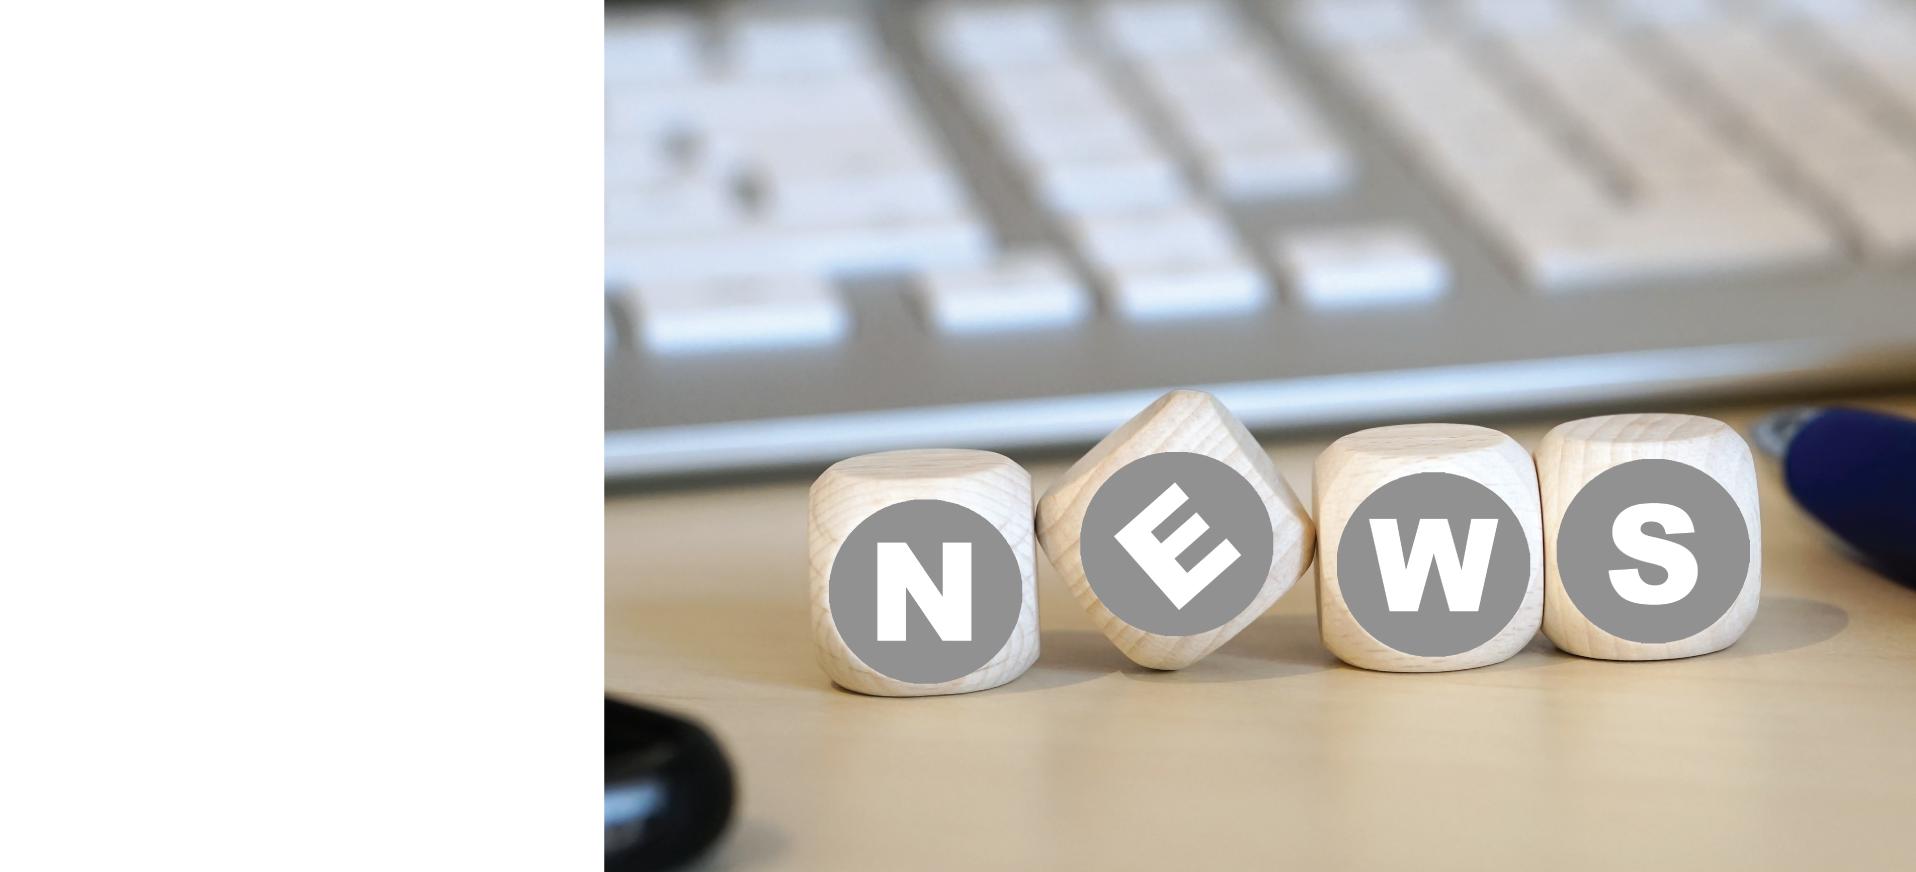 News blocks with keyboard